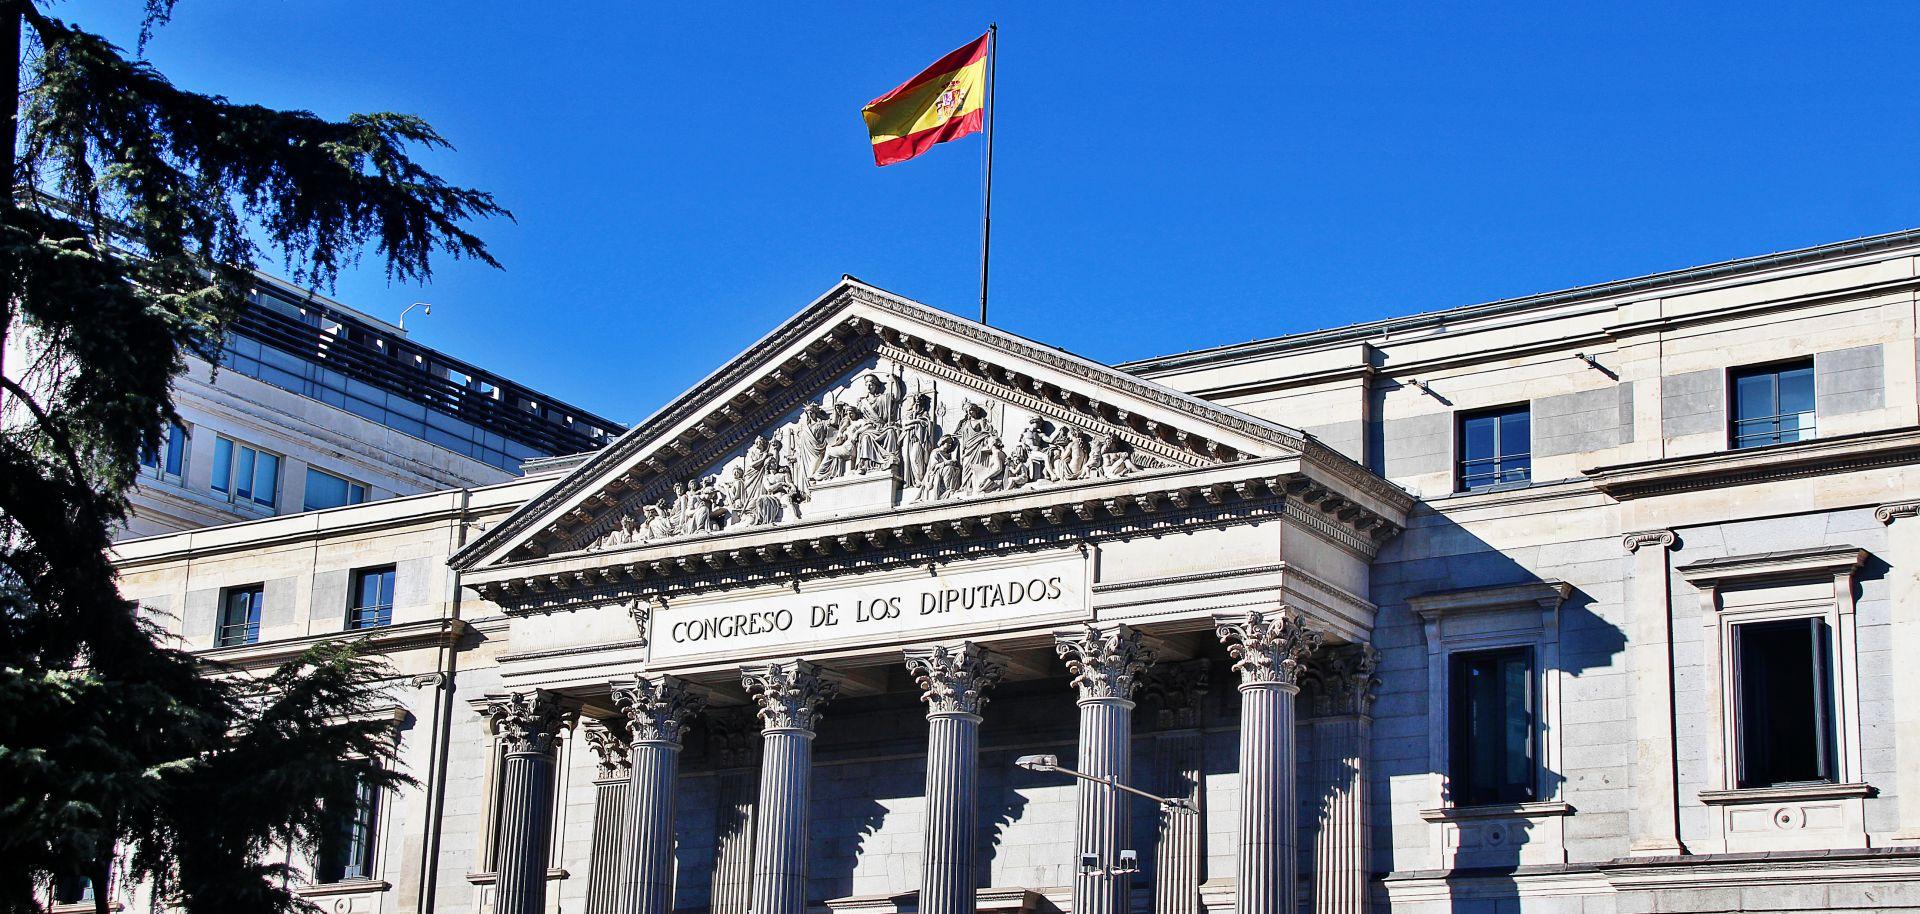 A photo of Spain's Congress of Deputies building.